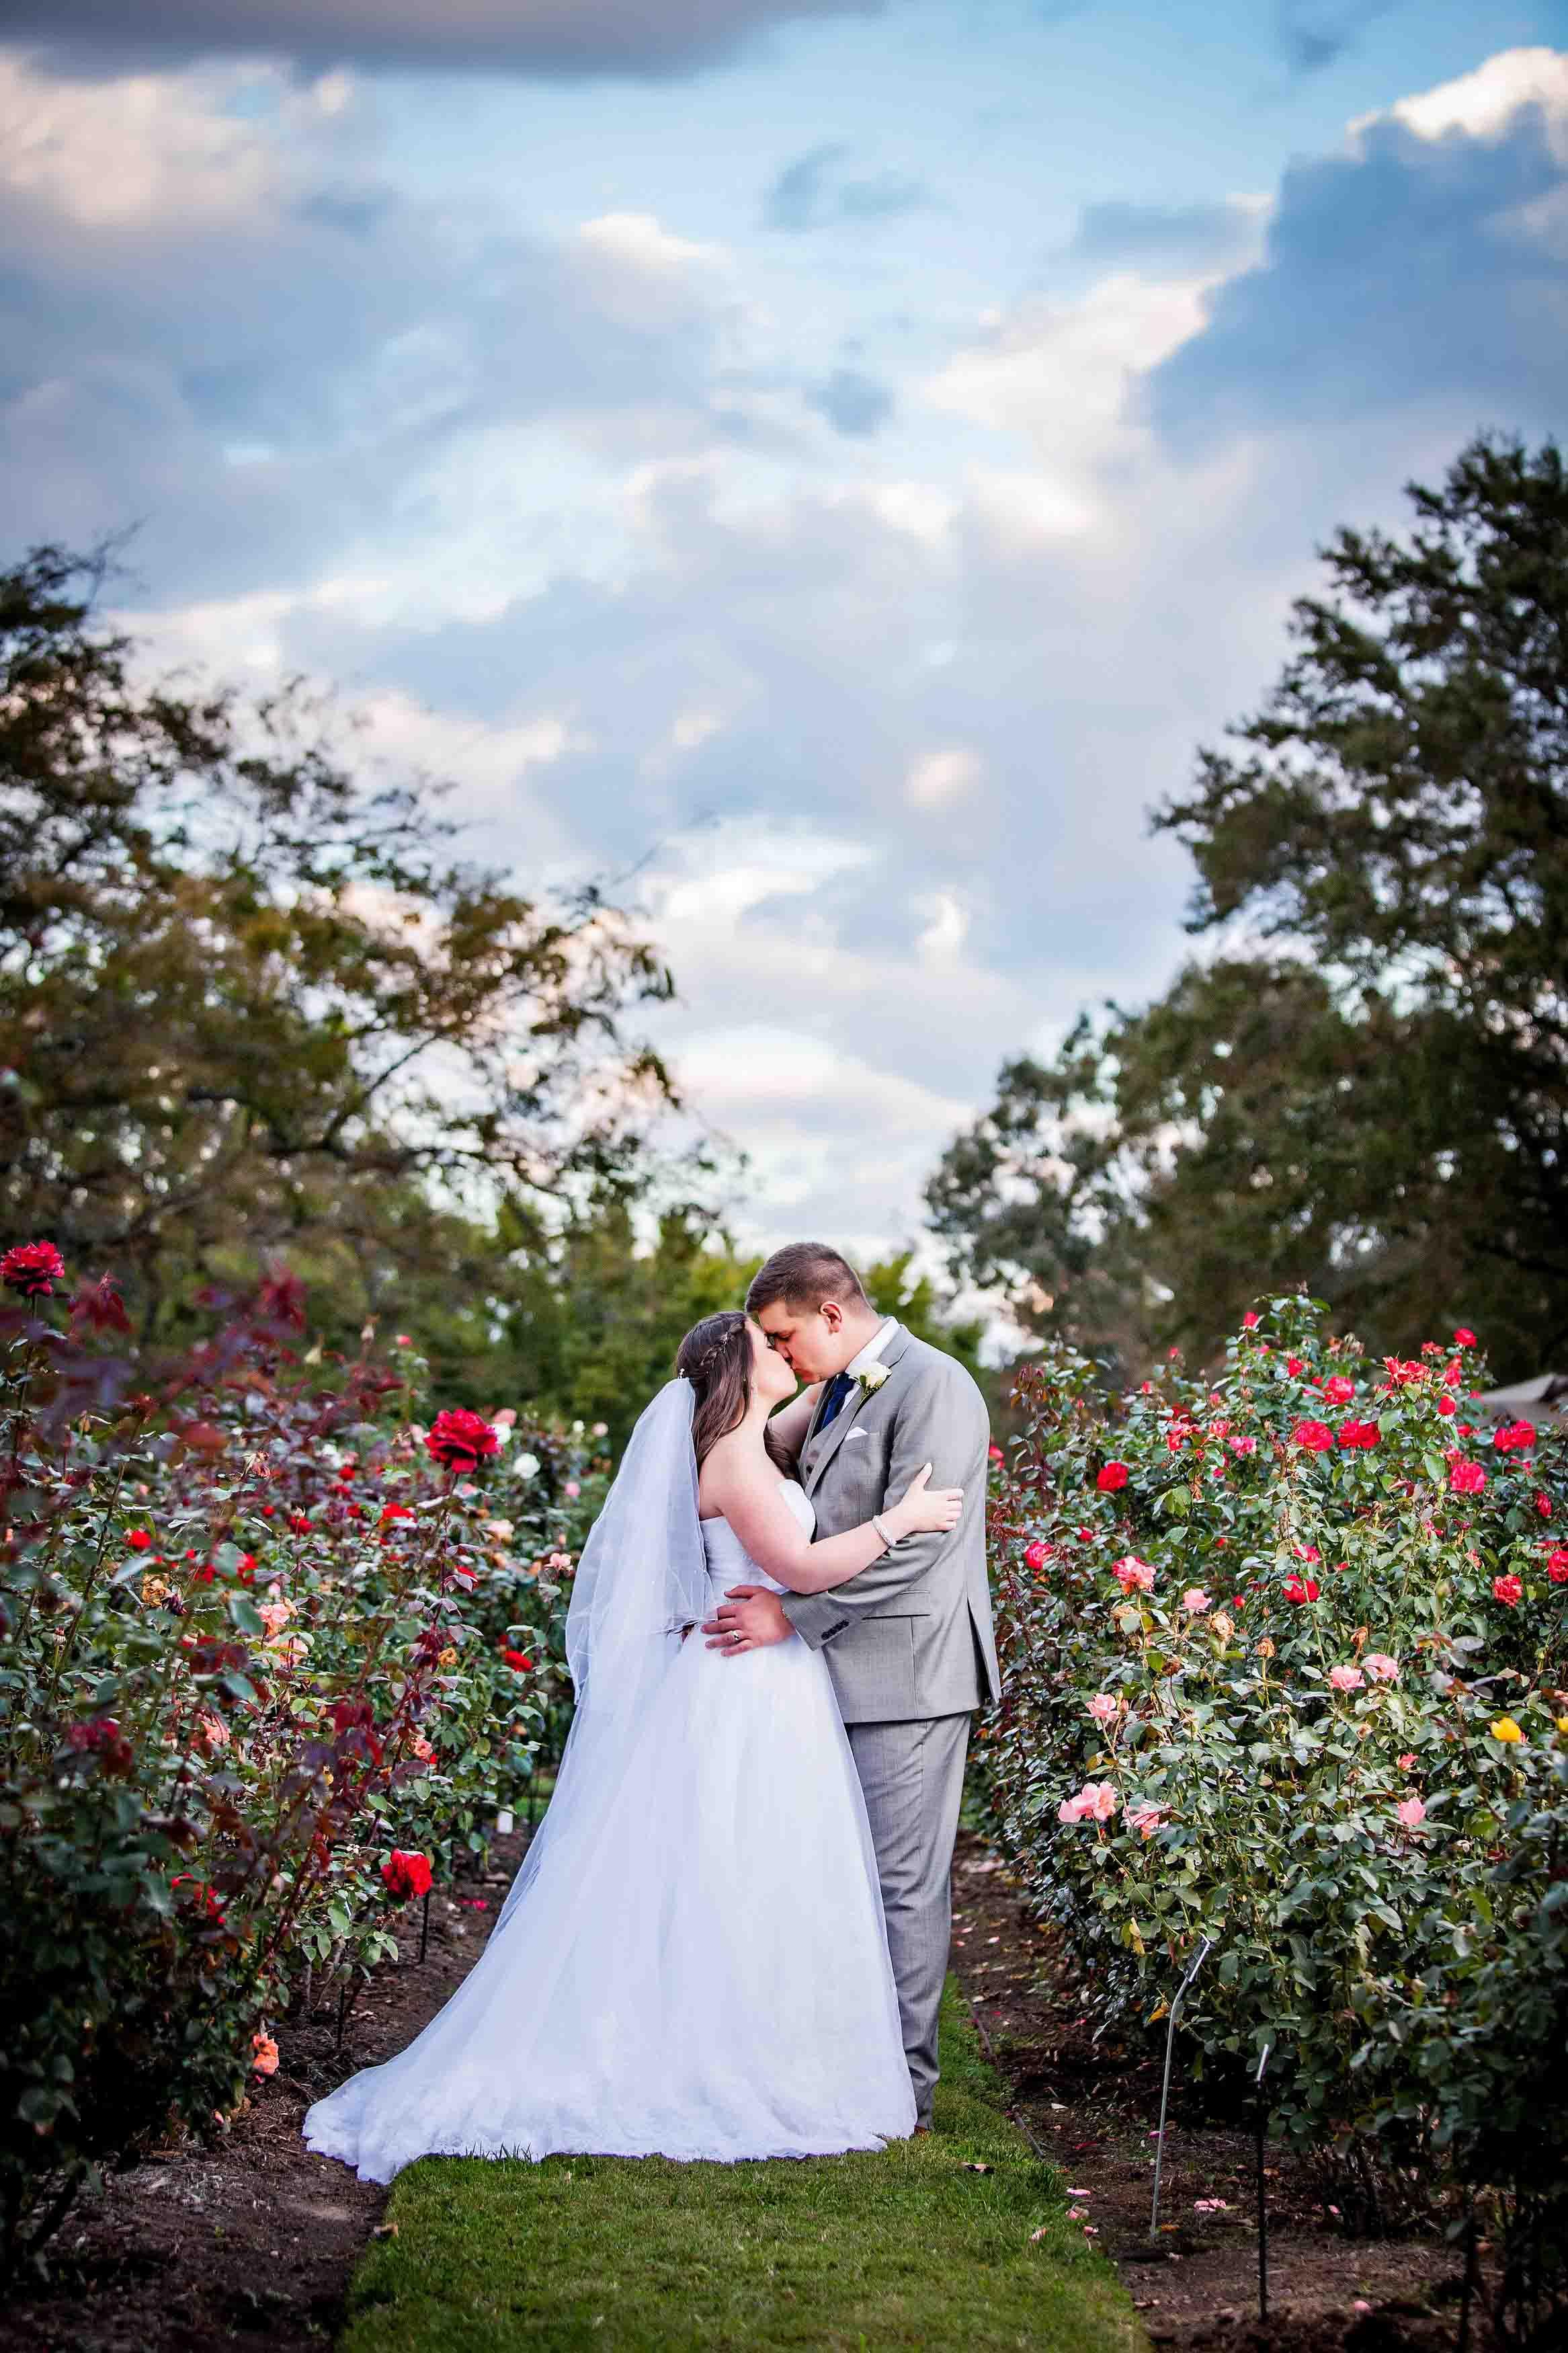 Norfolk Botanical Garden Wedding Photograph - Samantha And Greg - by John Cachero for Ross Costanza Photography